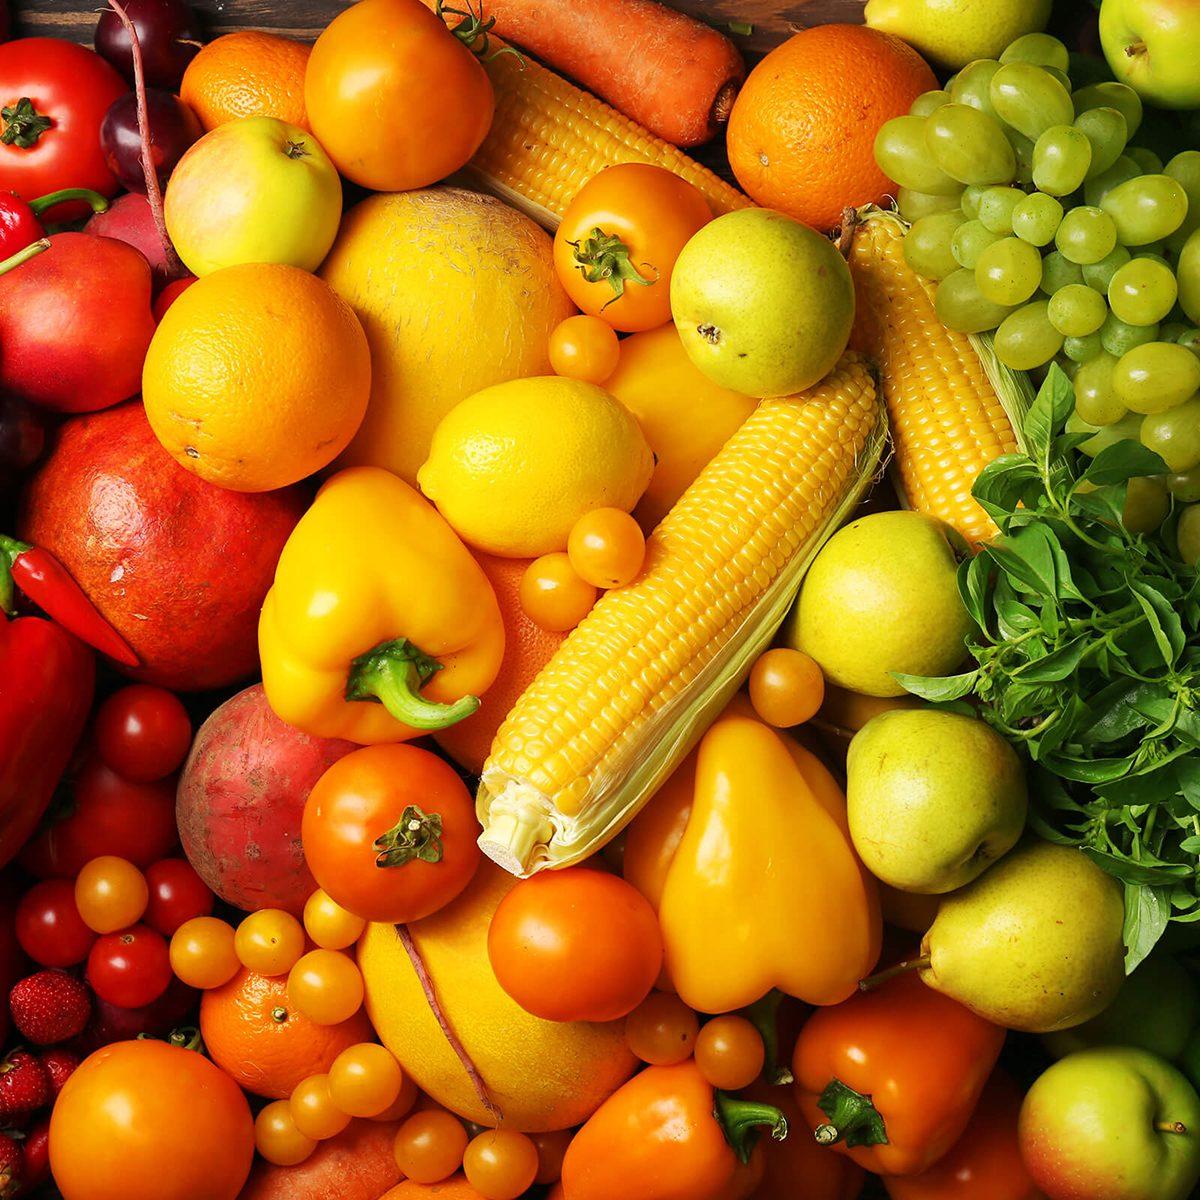 Raw veggies and fruits